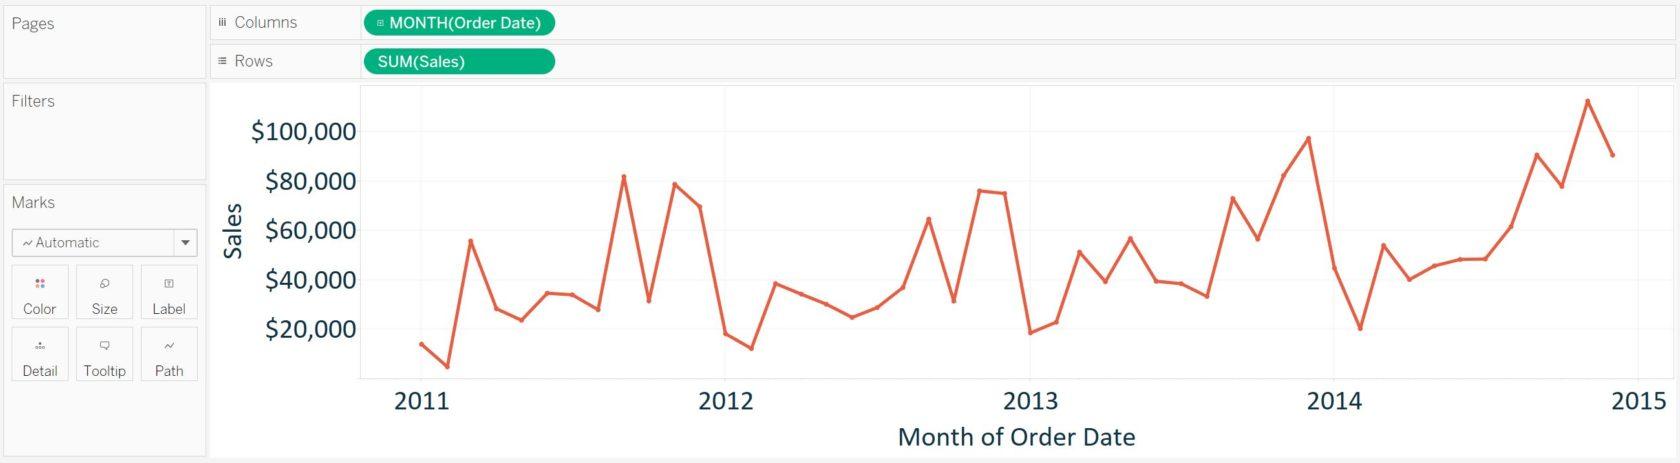 Tableau Line Graph by Continuous Month